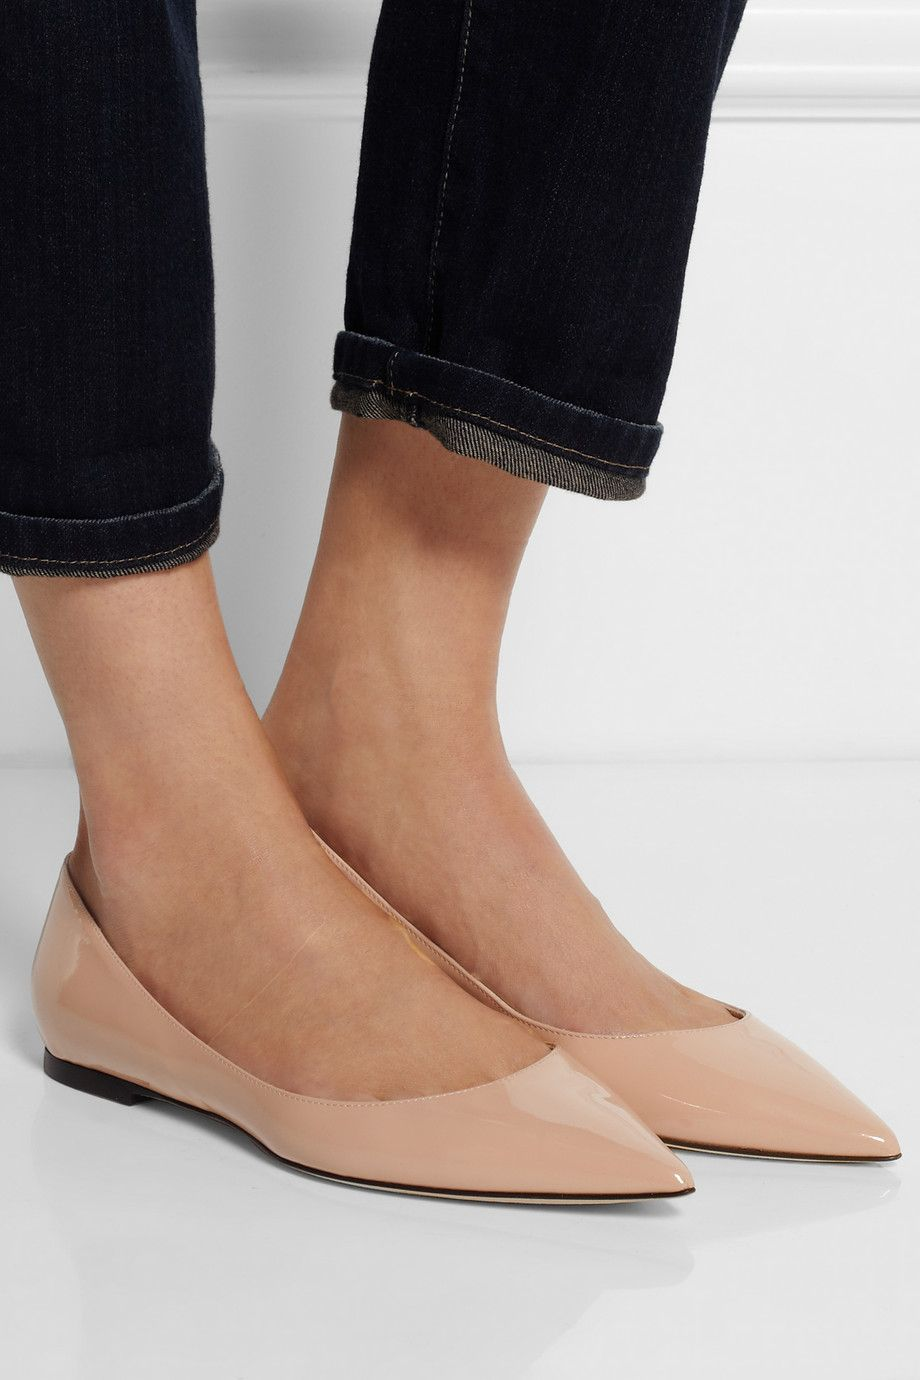 Alina ballerina shoes - Nude & Neutrals Jimmy Choo London MClX1